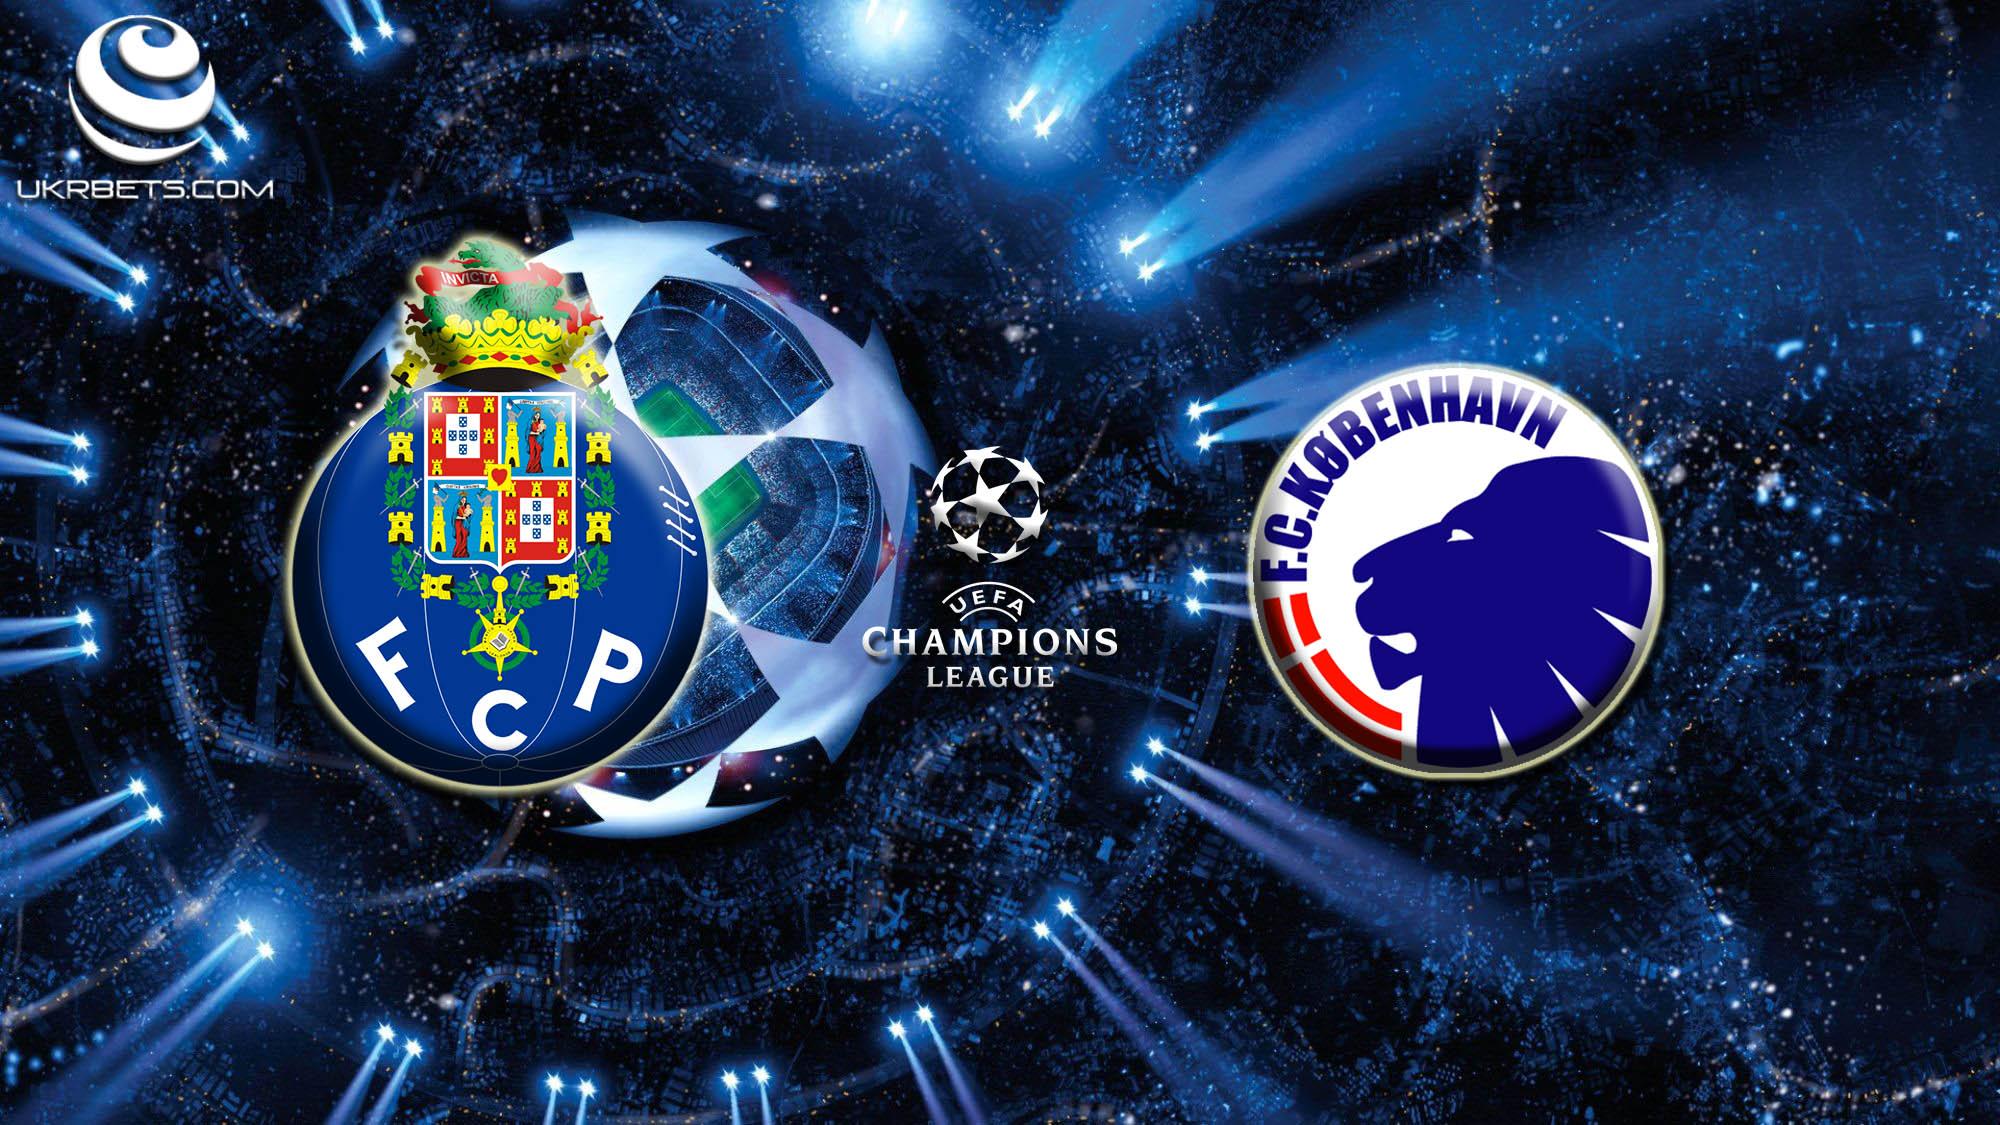 футбол прогноз на лигу чемпионов